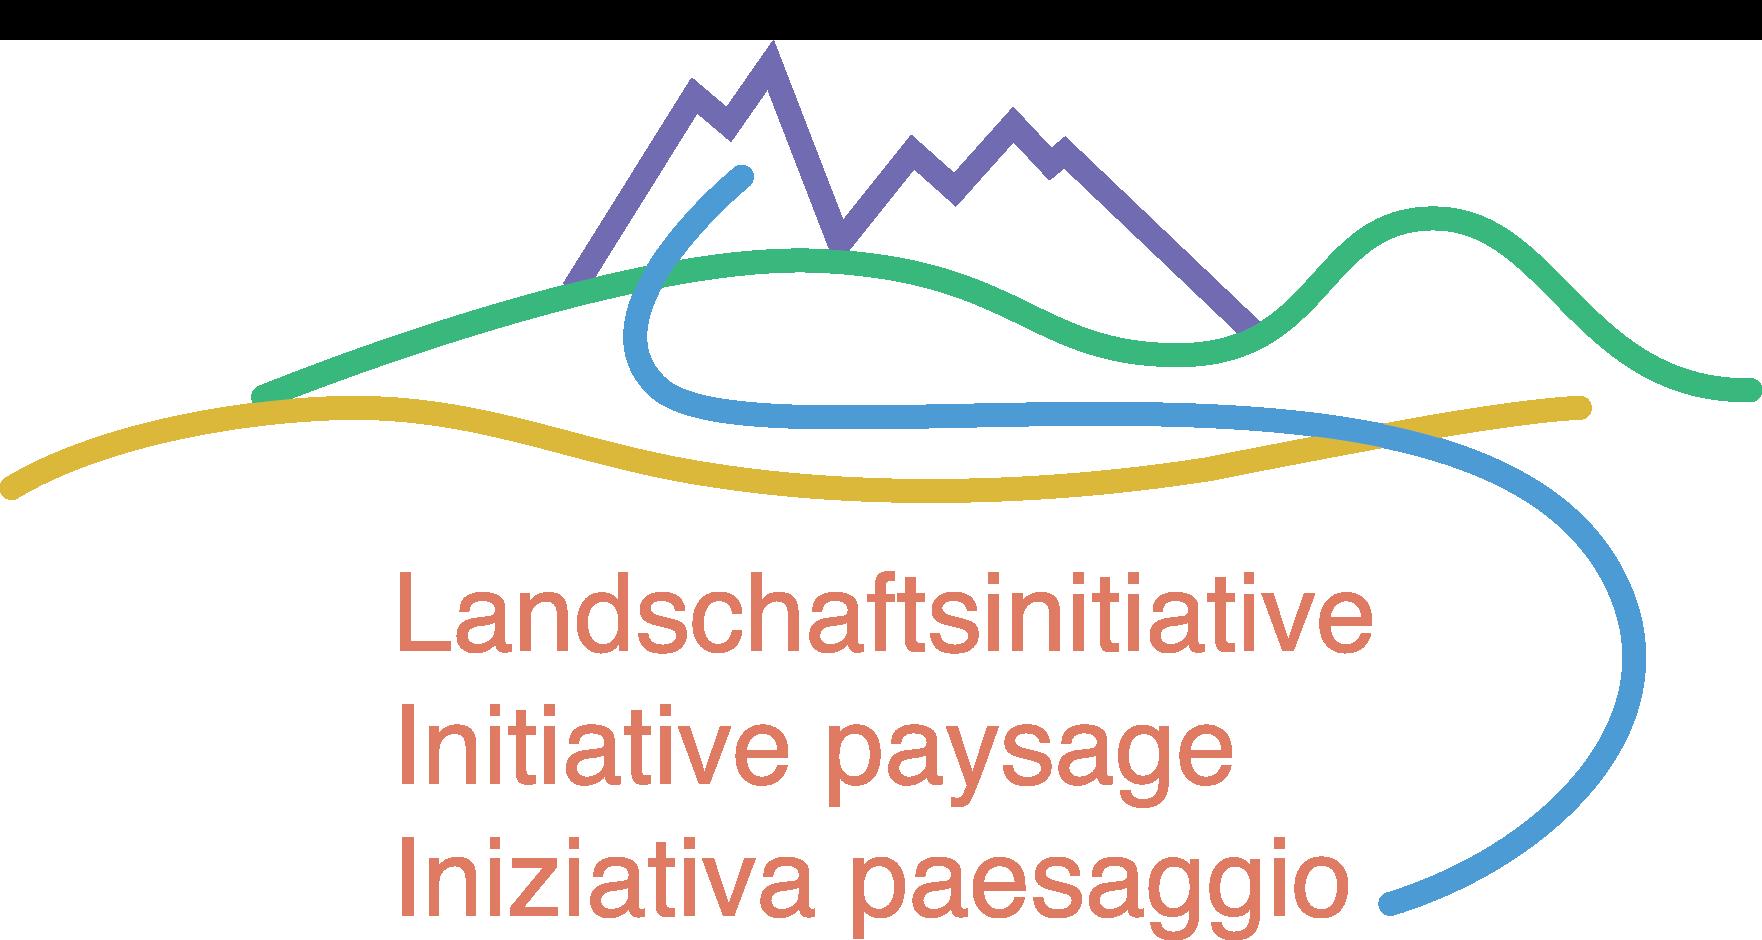 Initiative paysage